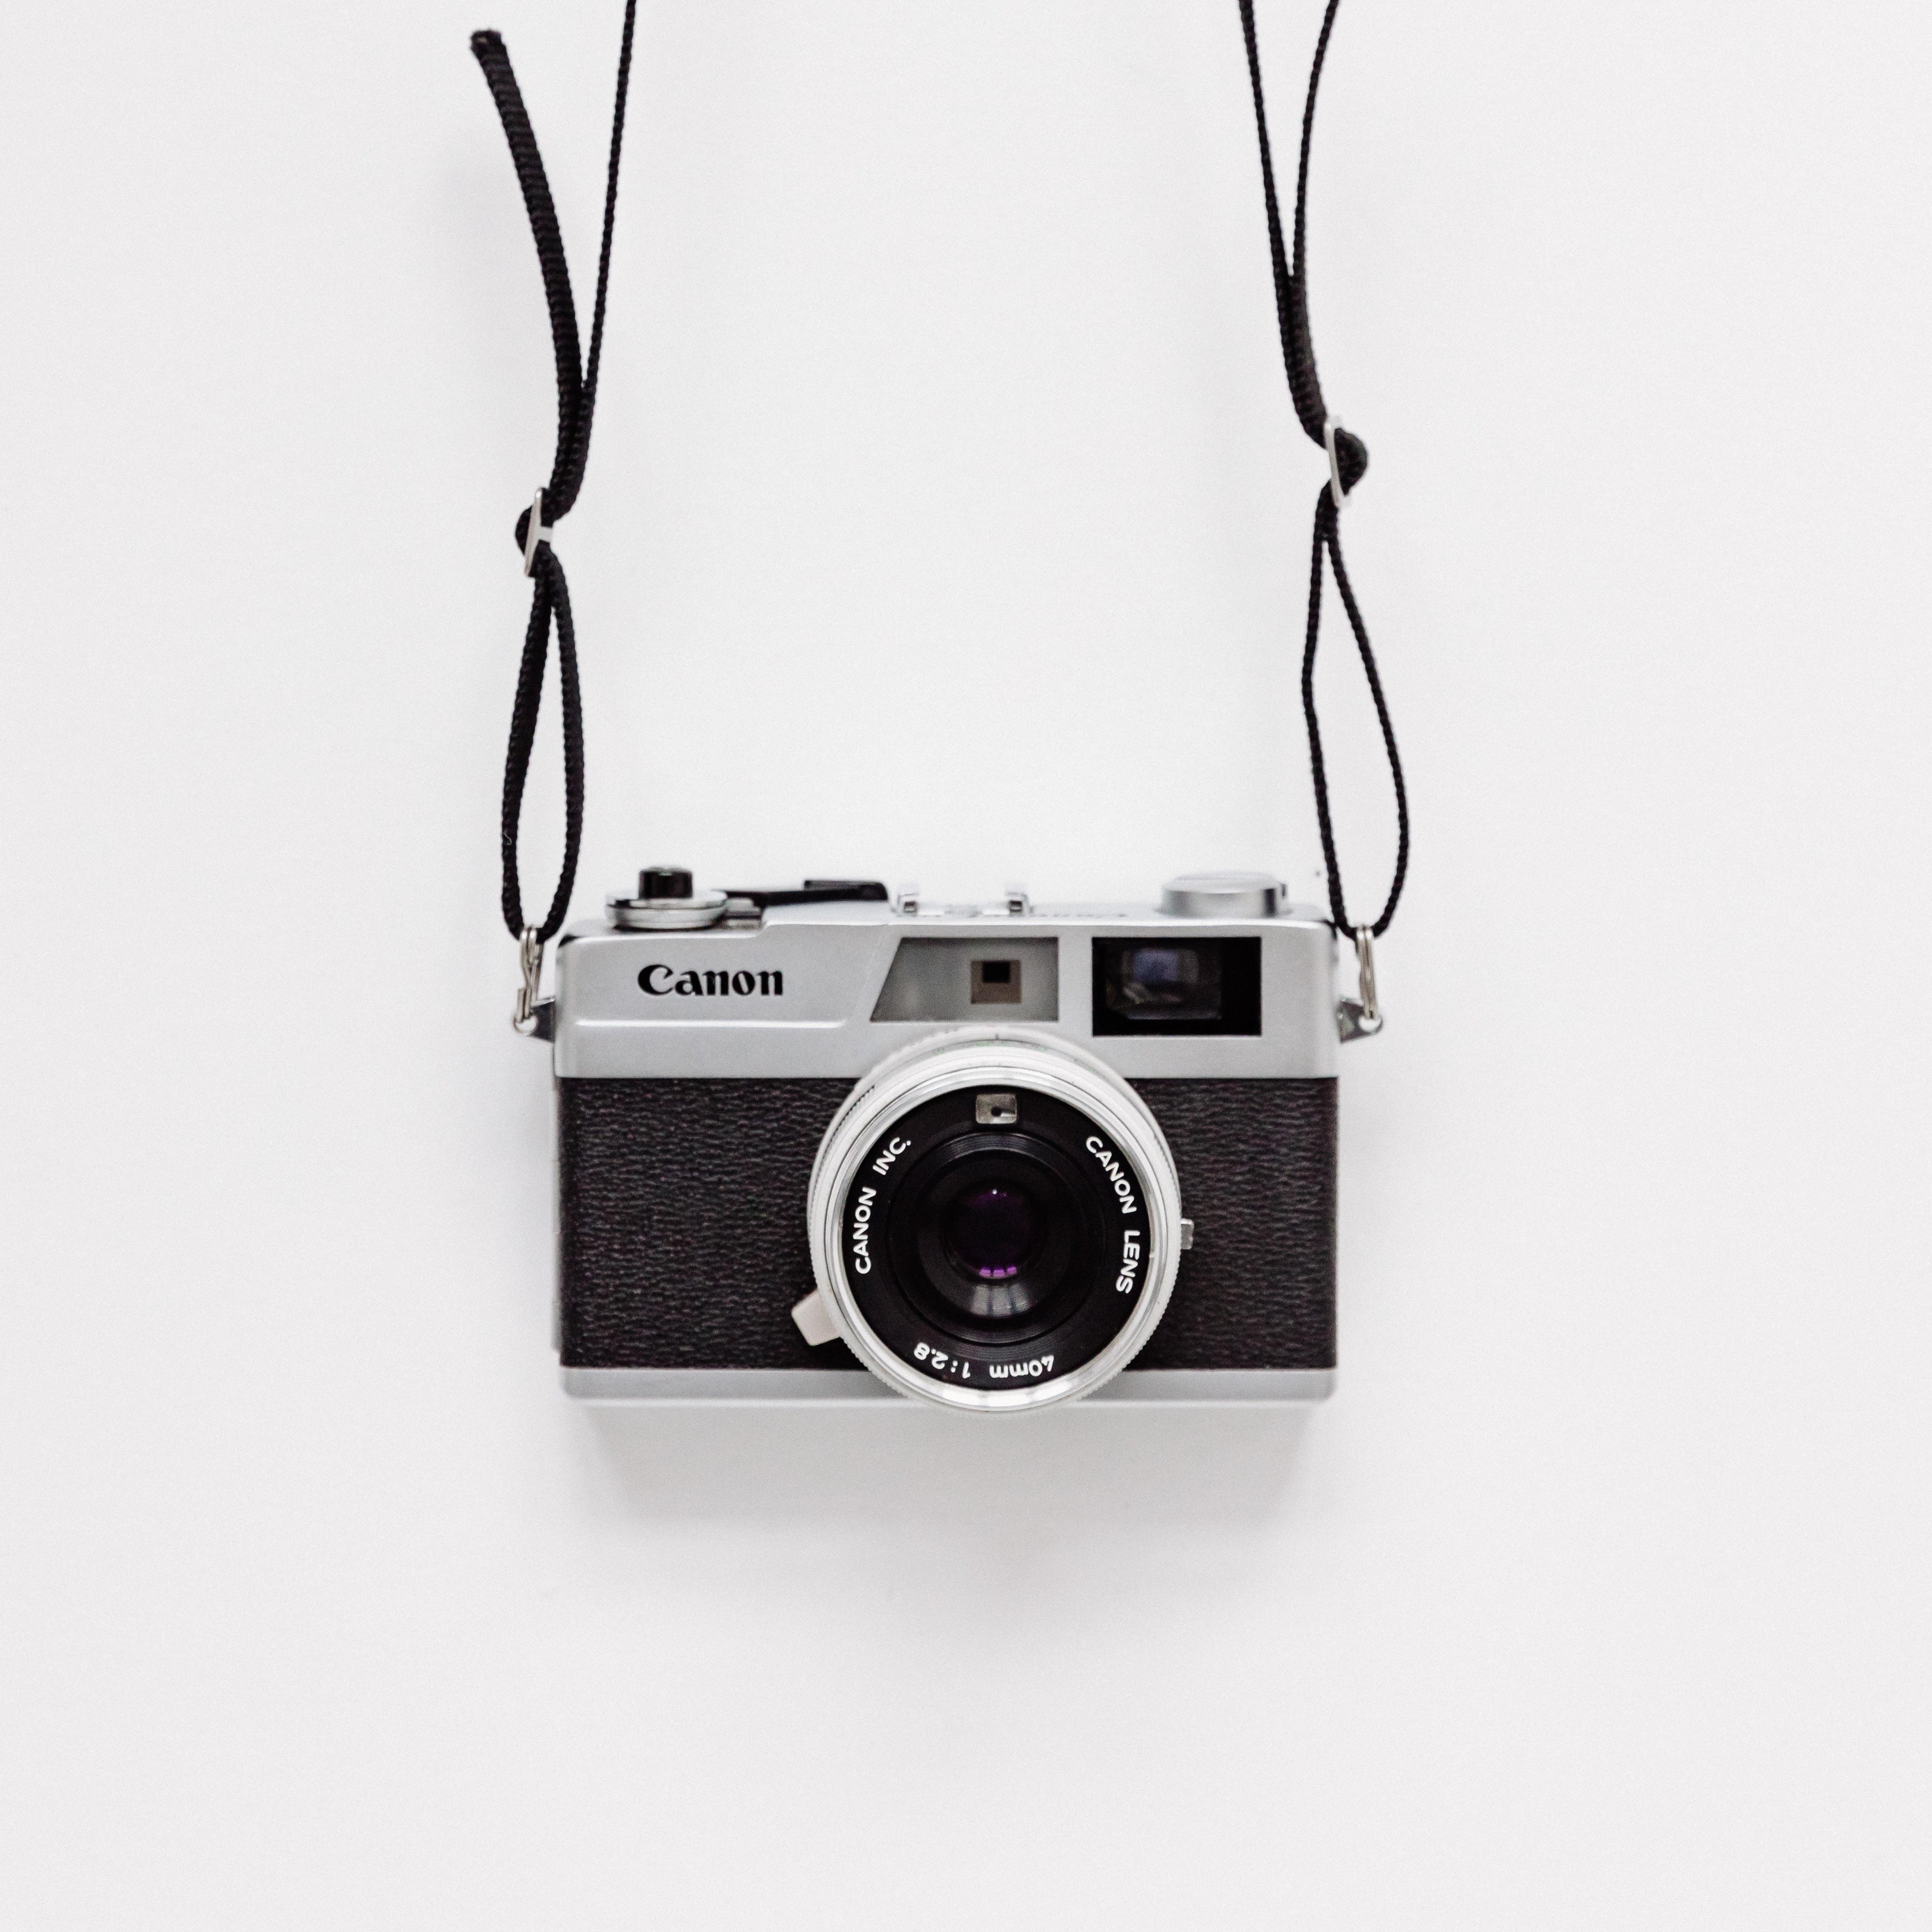 Fototermin besprechen